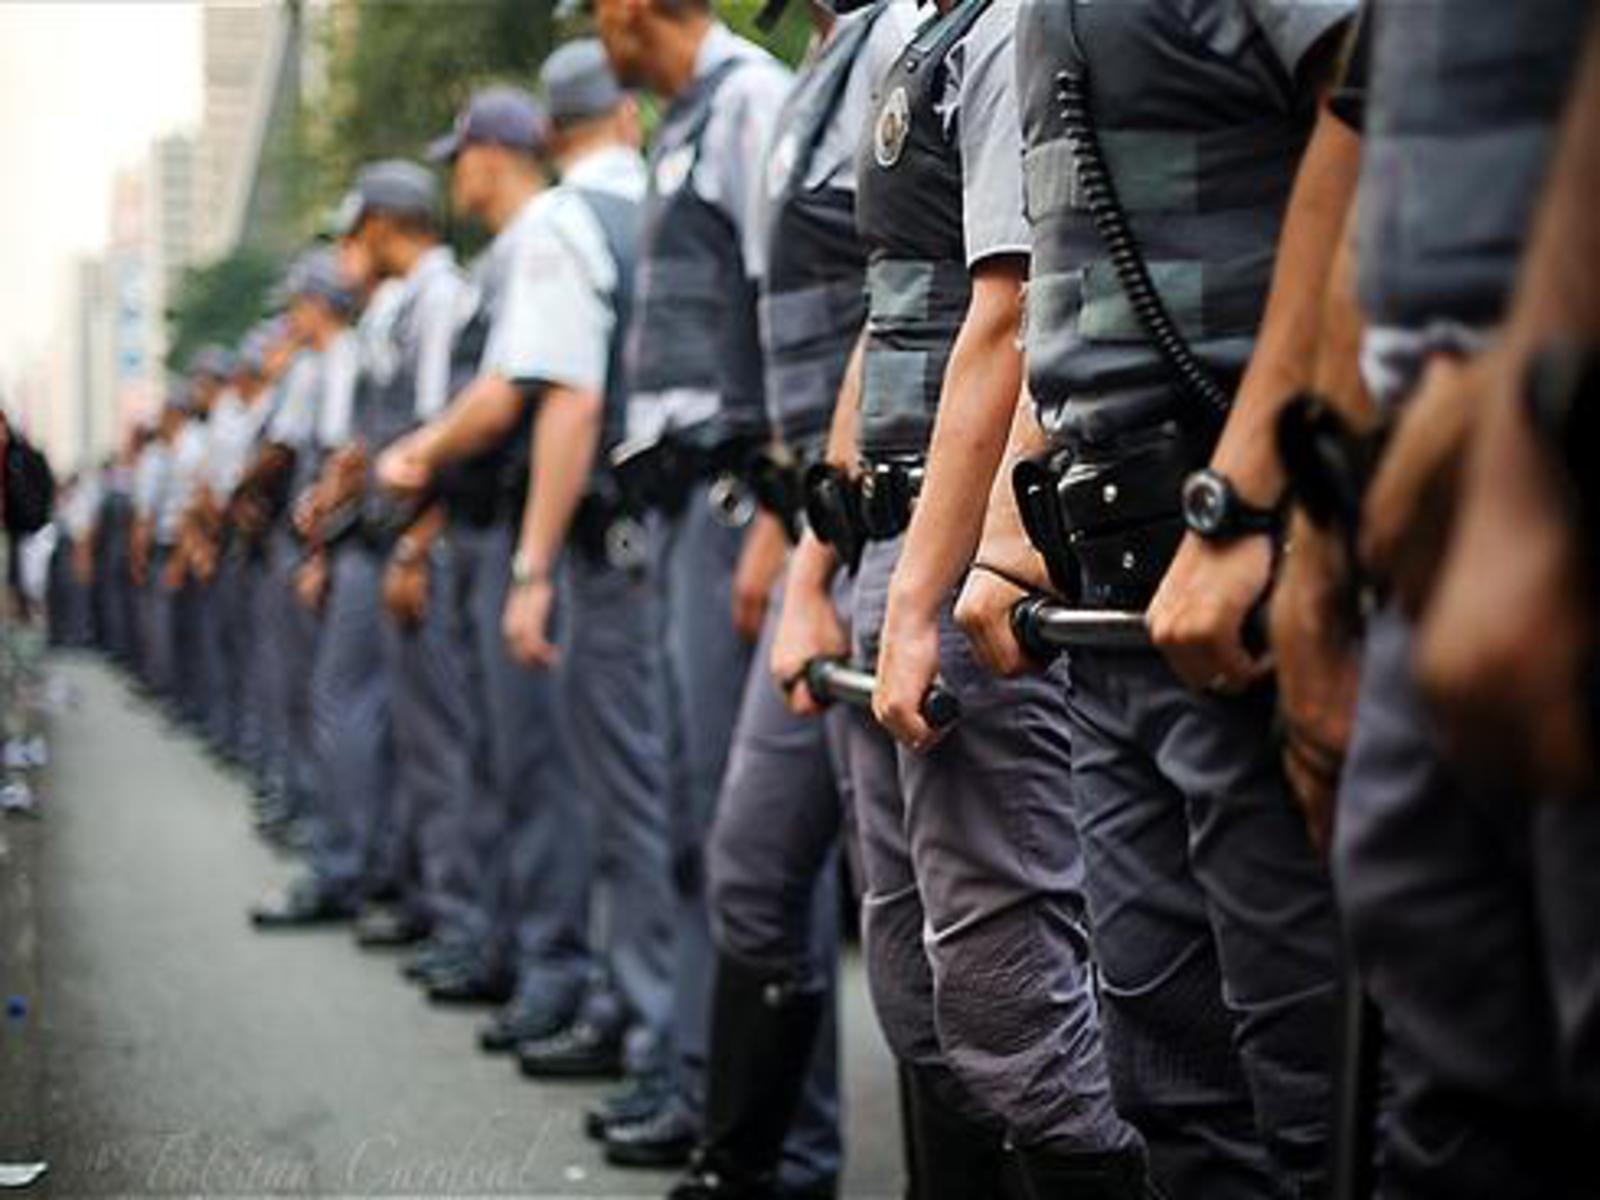 Plano de saúde para policial militar